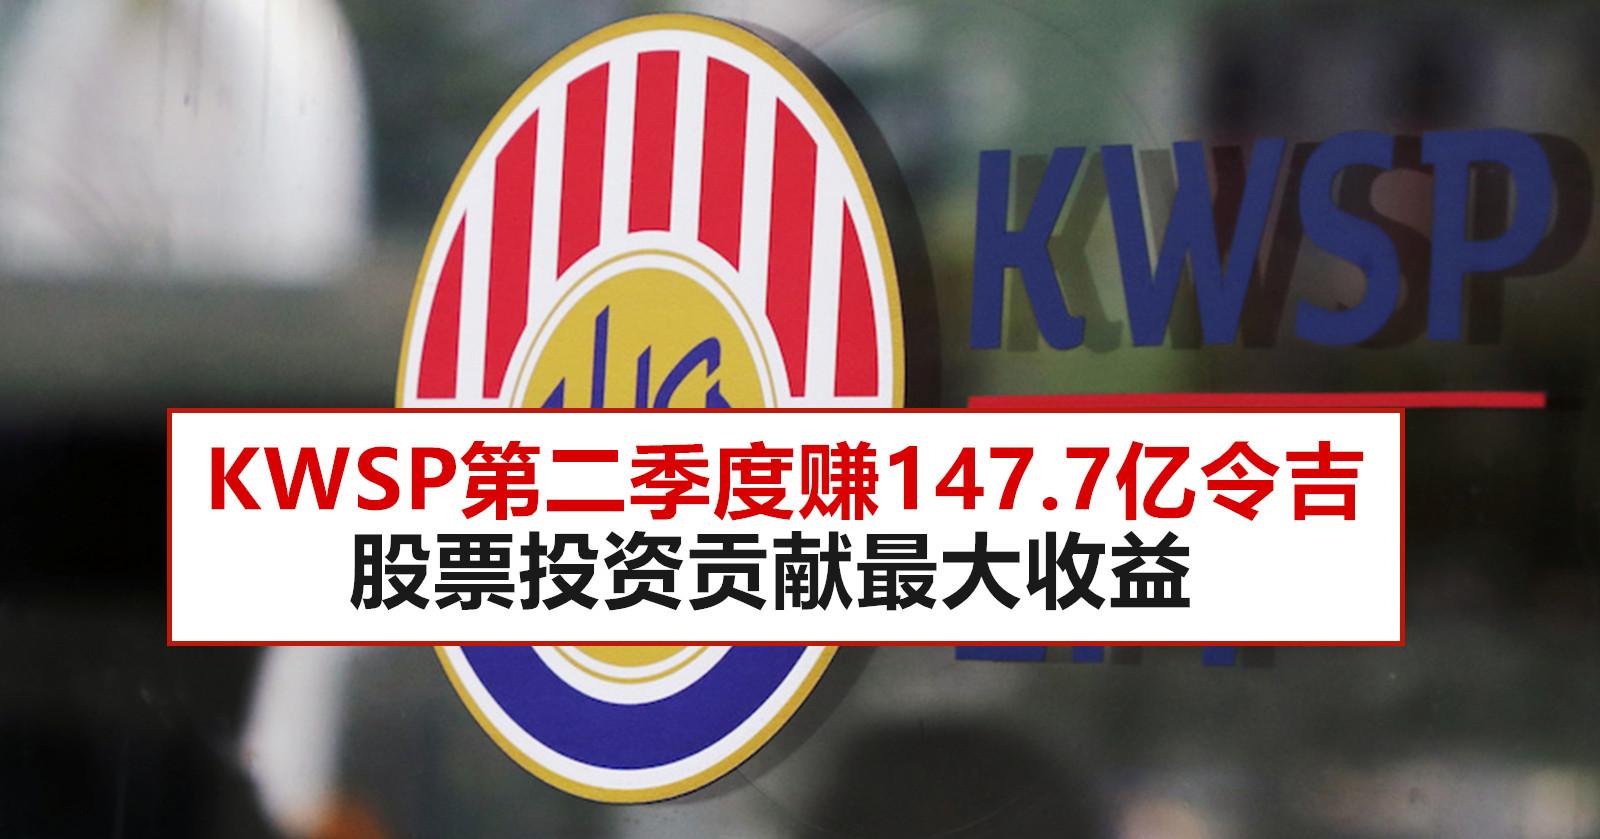 KWSP第二季度赚147.7亿令吉